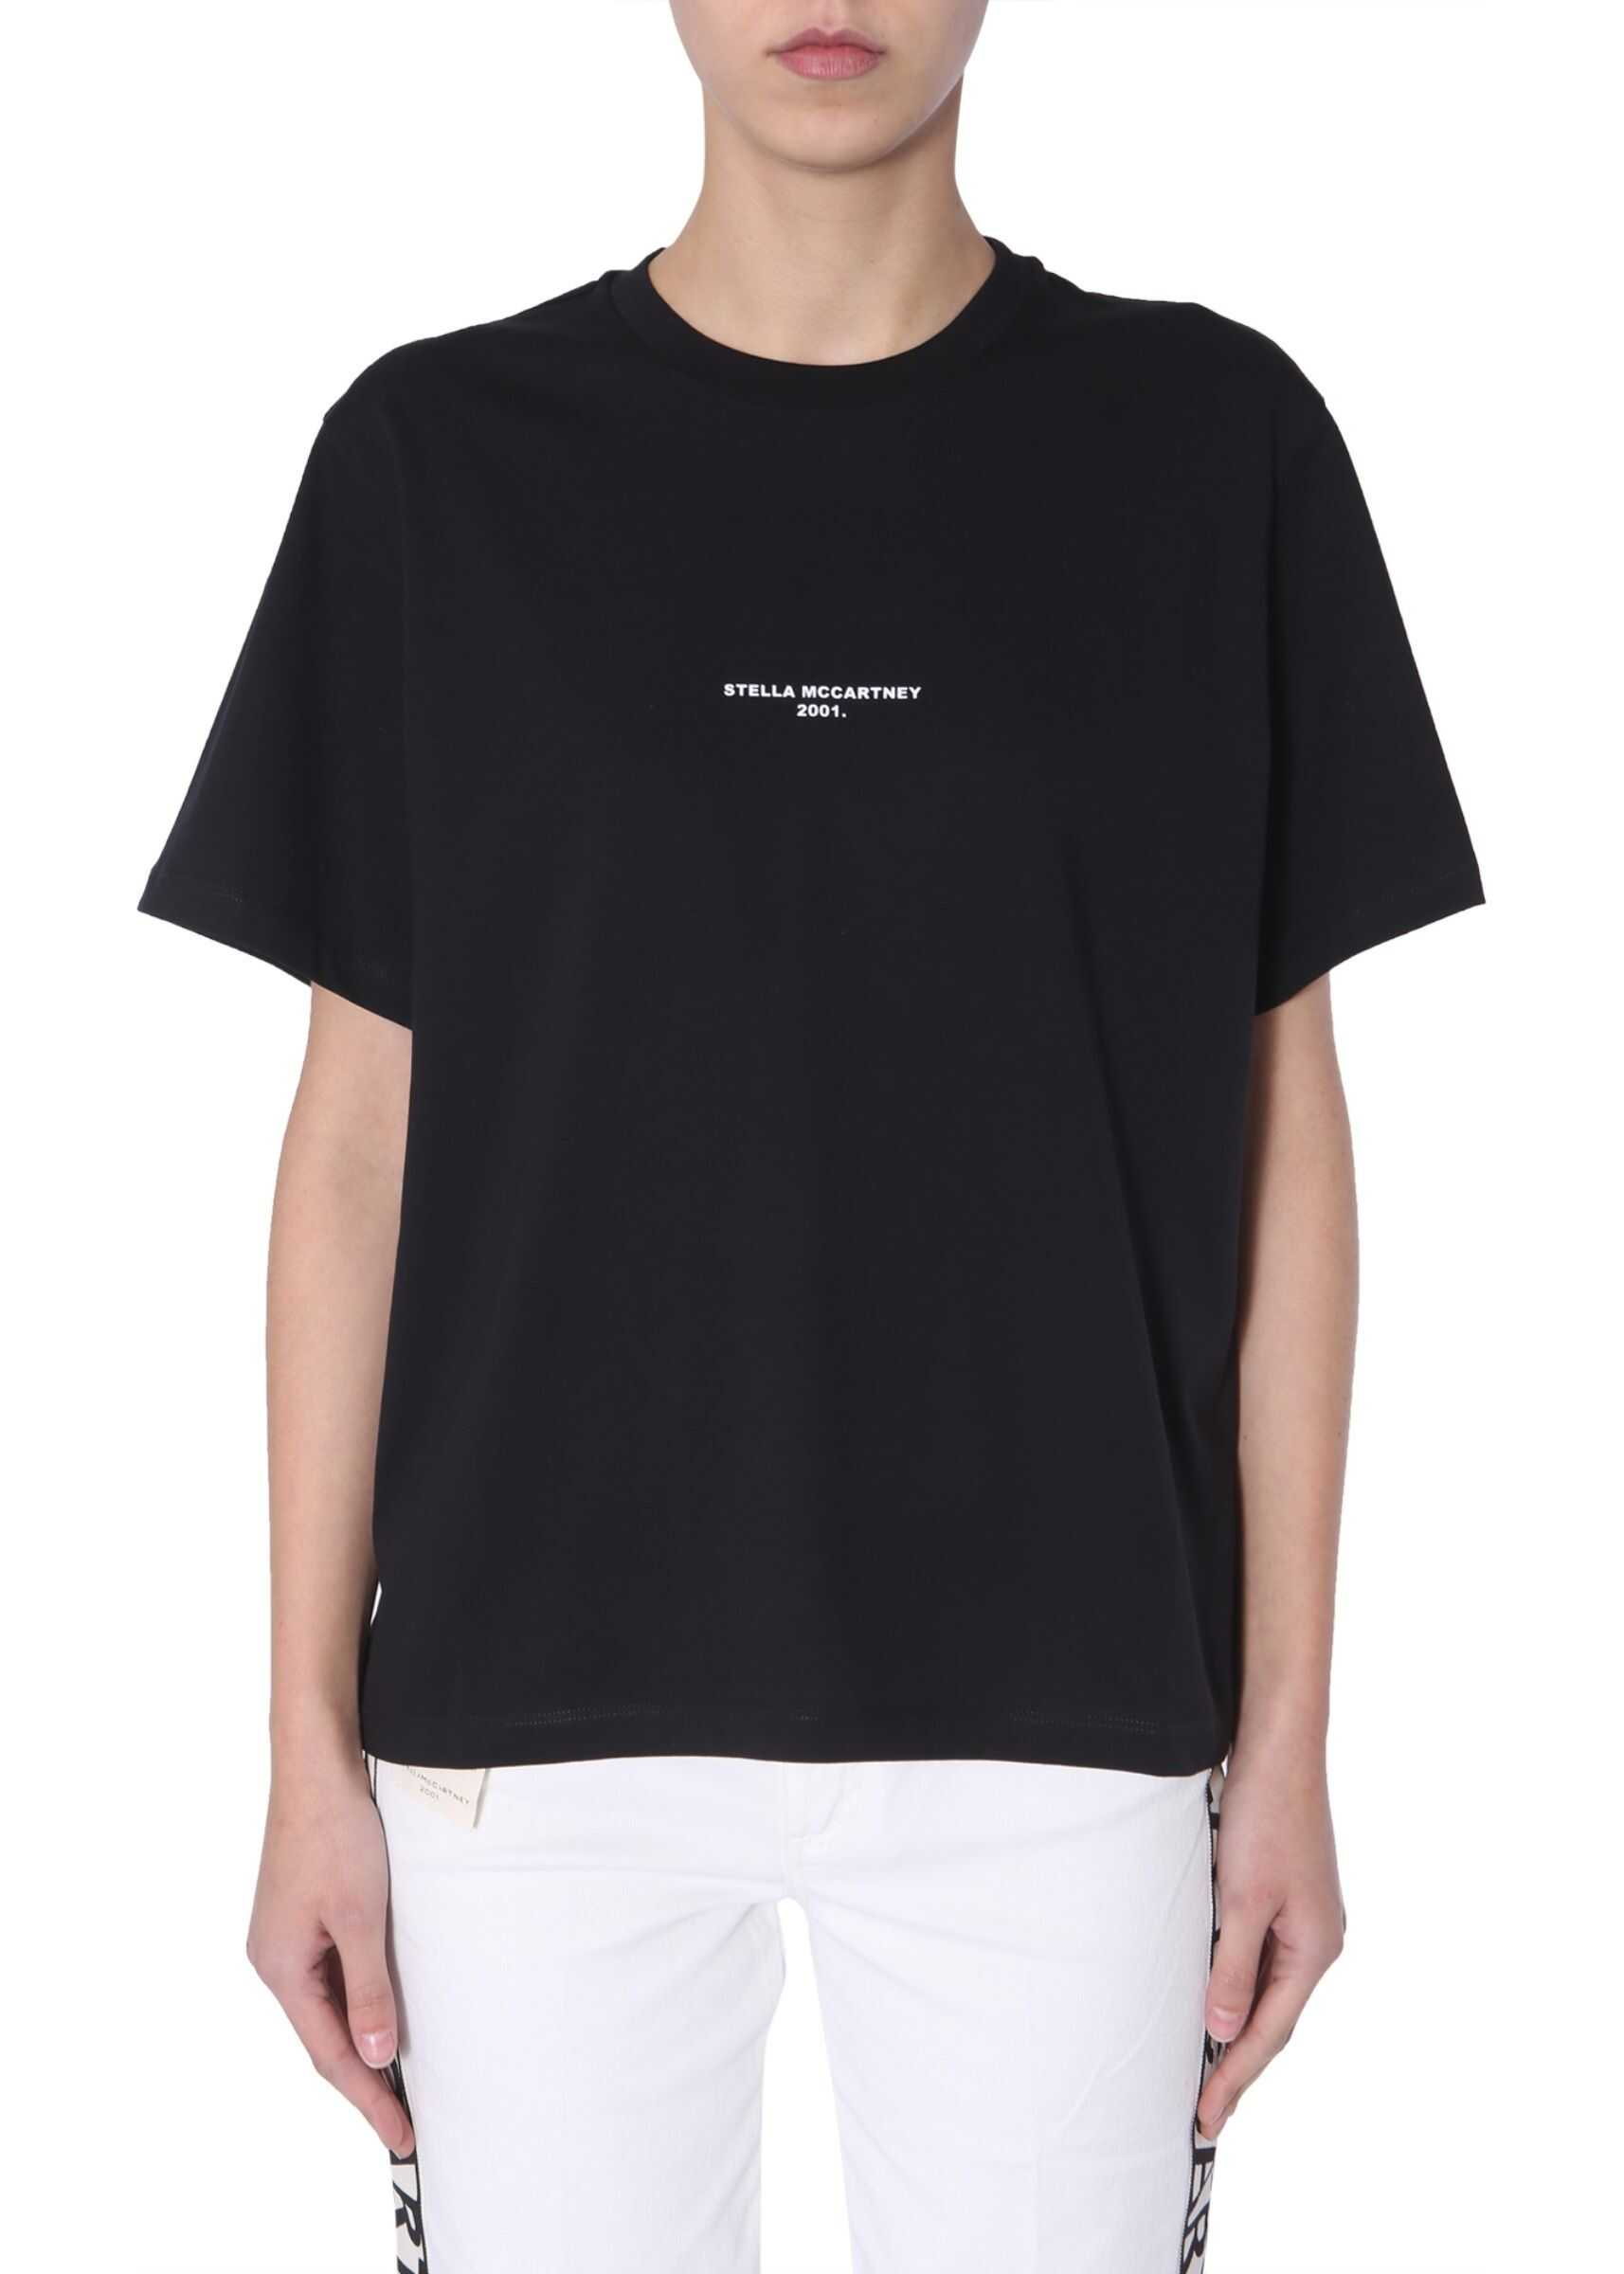 adidas by Stella McCartney Crew Neck T-Shirt BLACK